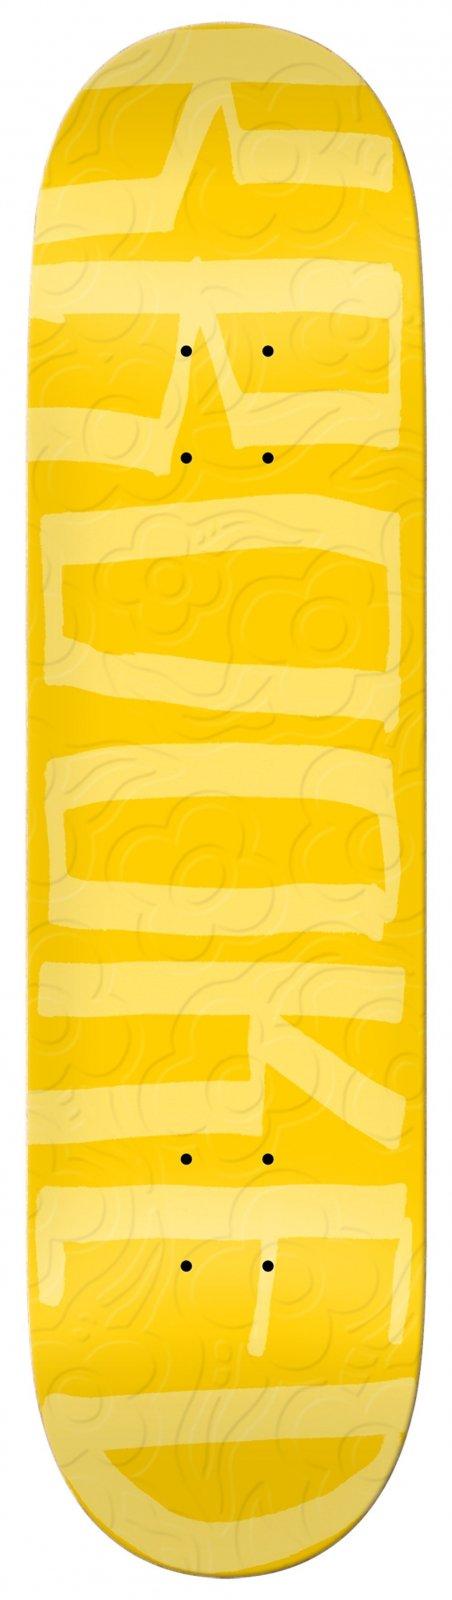 Krooked Mono Slick Yellow 8.25 x 32